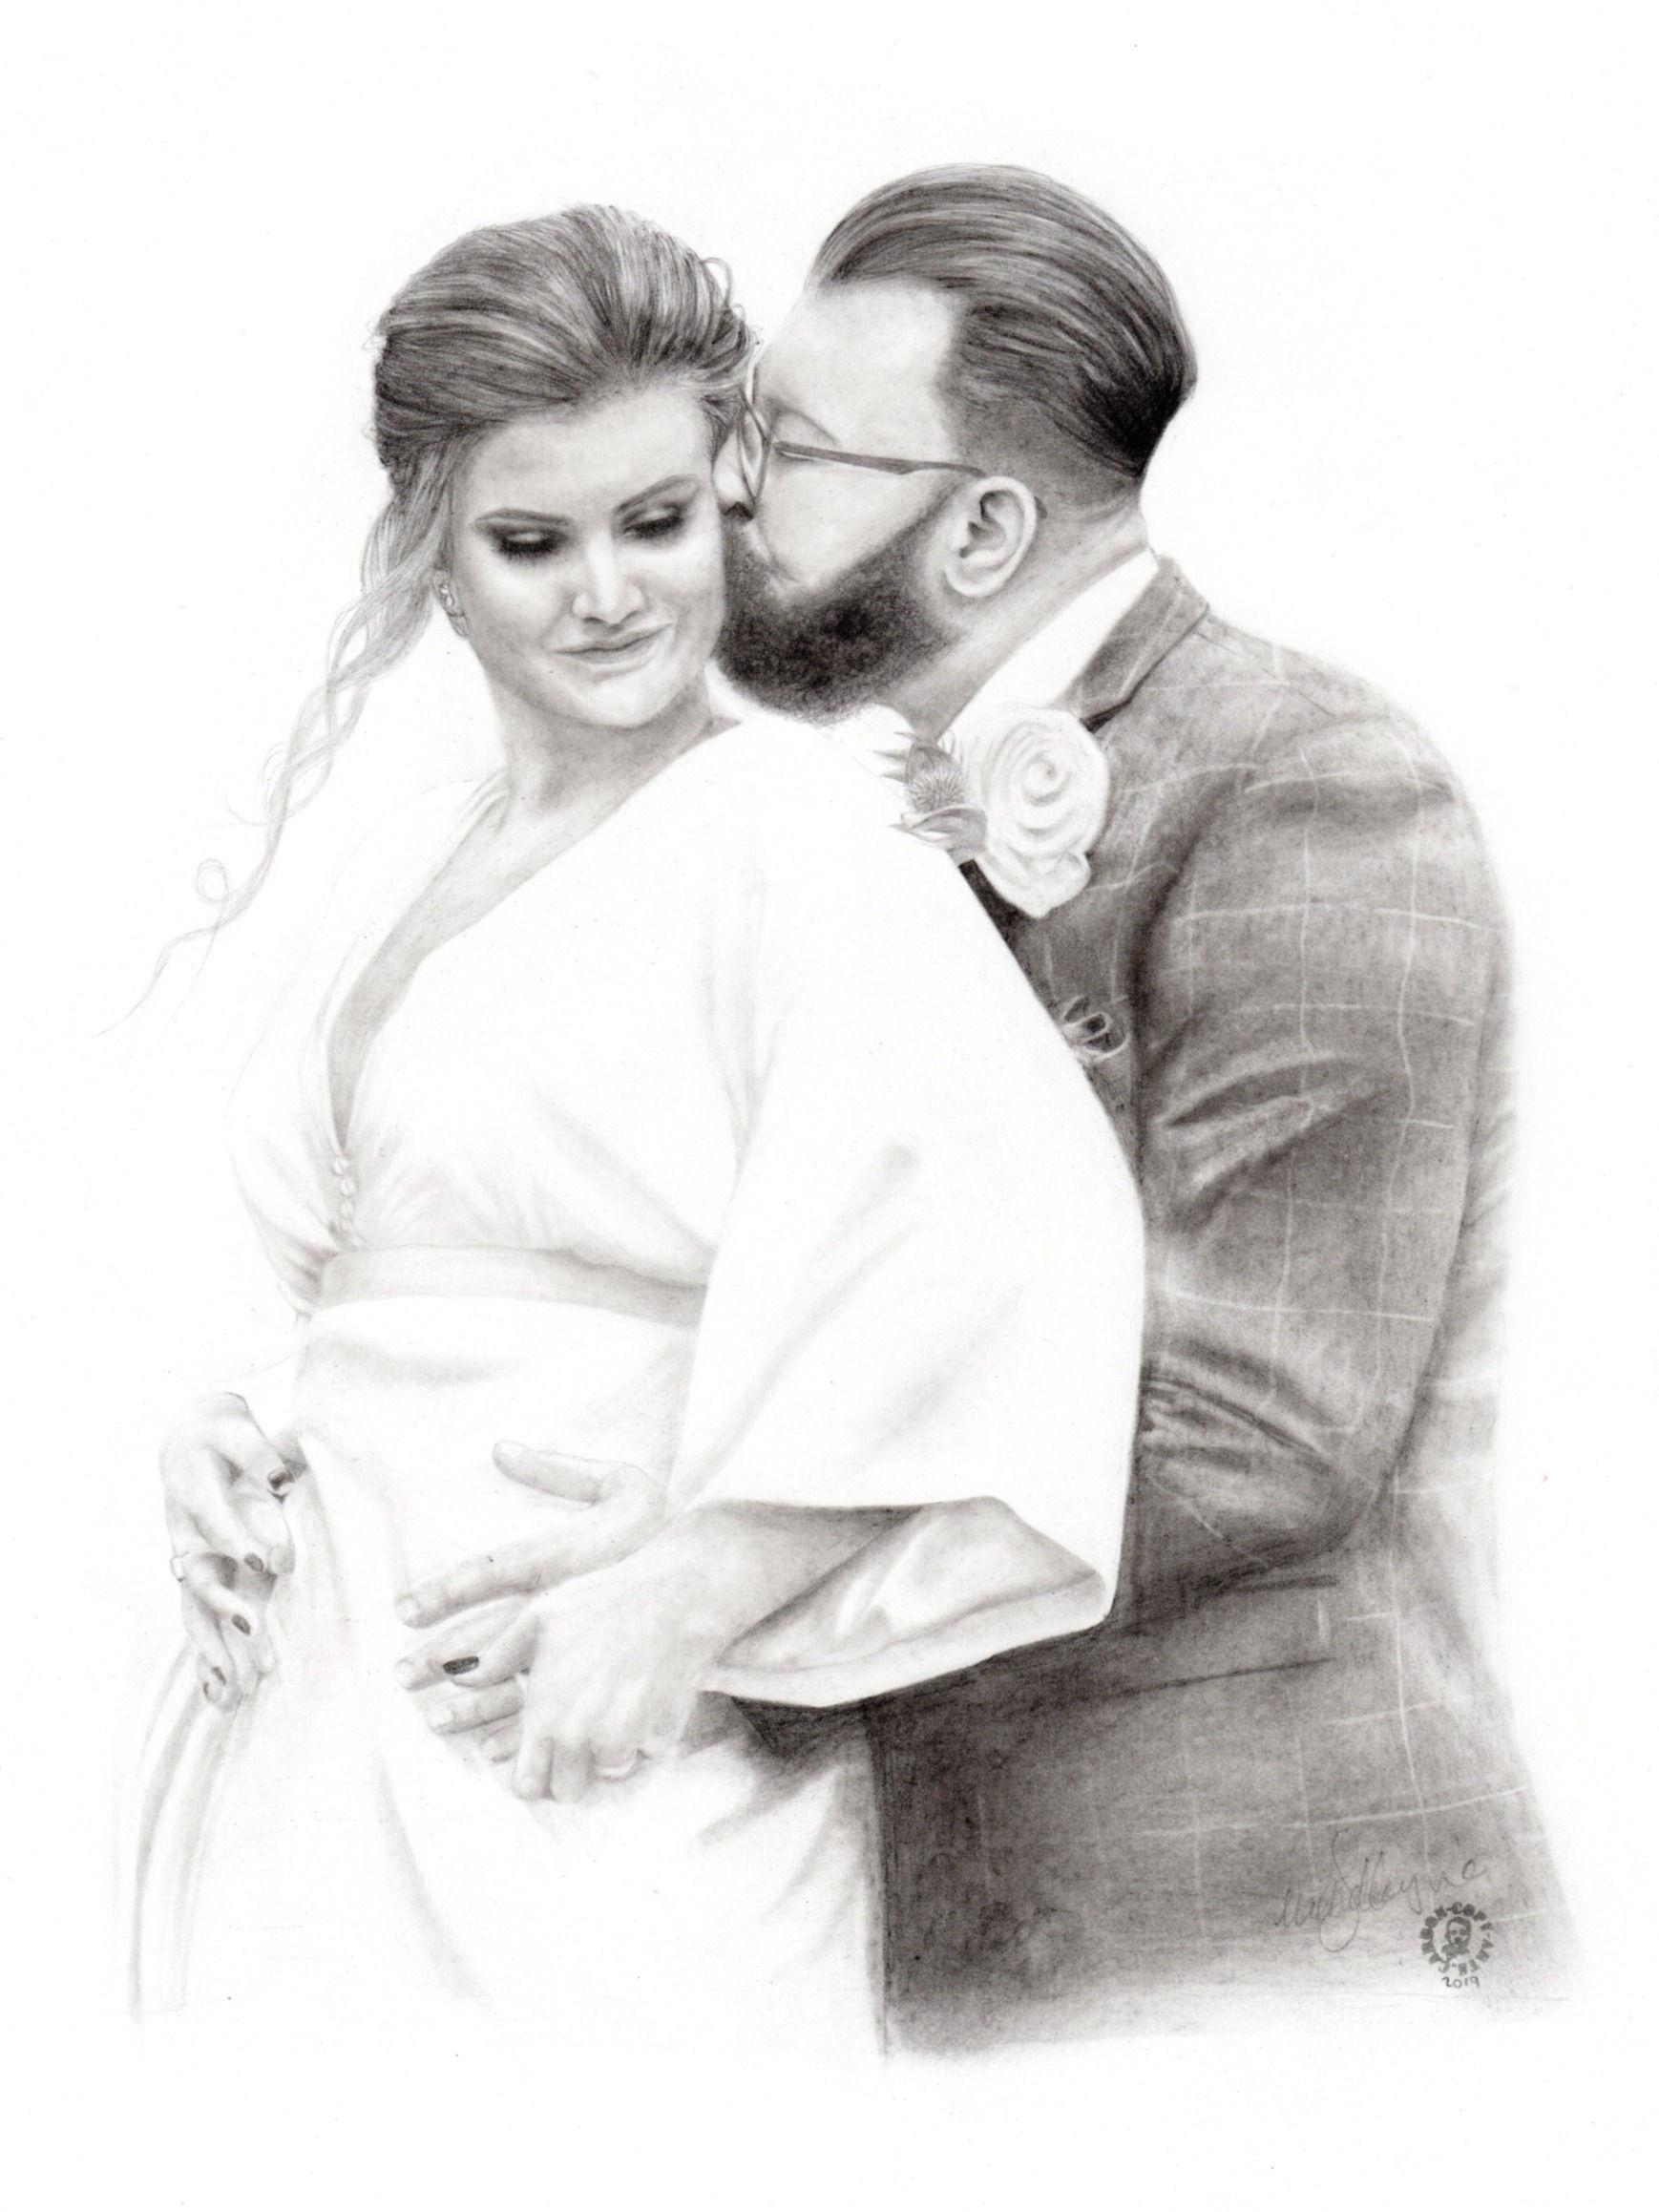 Wedding Portrait in Pencil